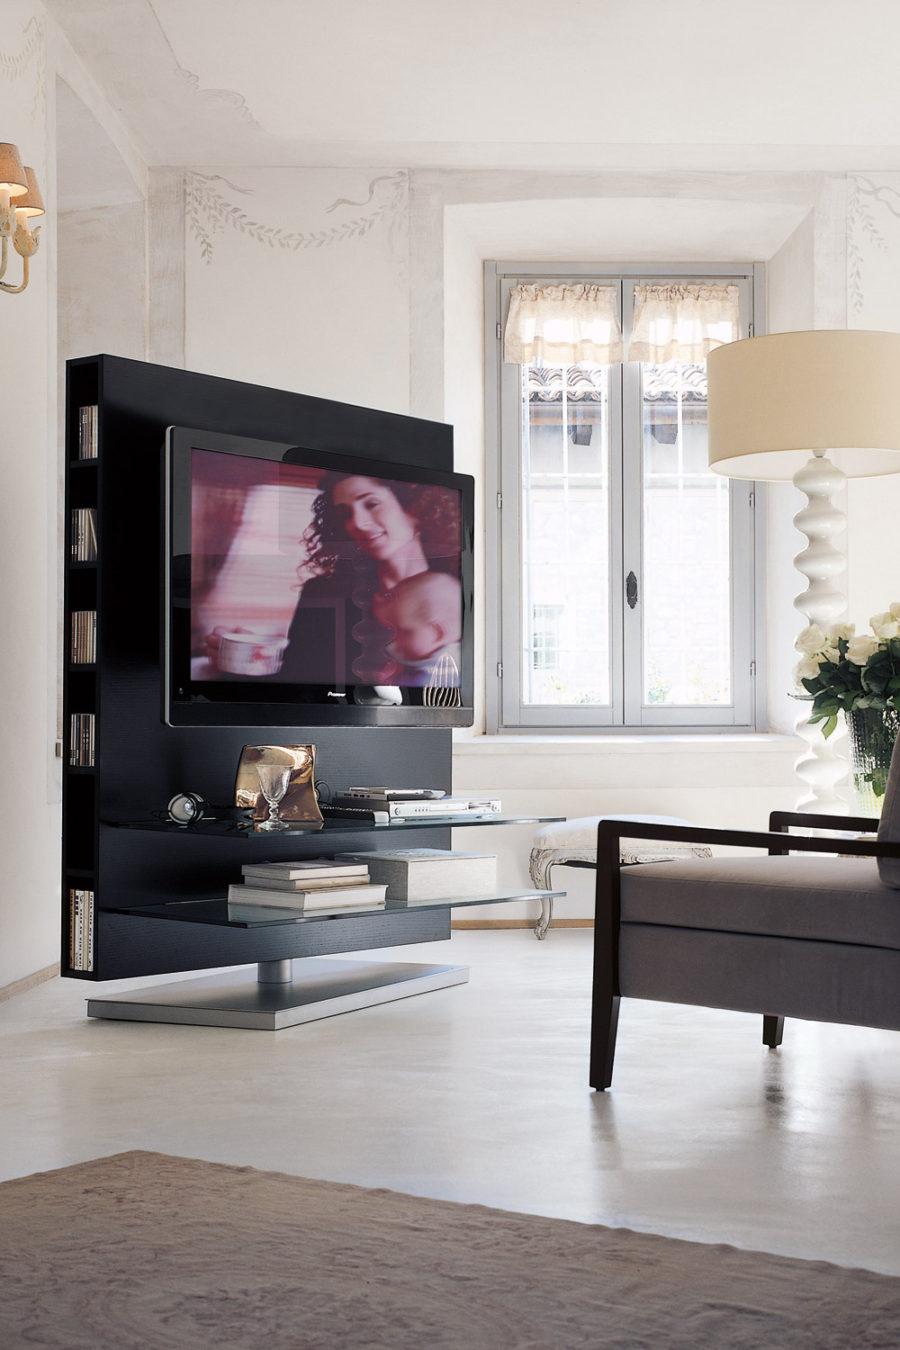 Подставка для телевизора Porada от пола до потолка